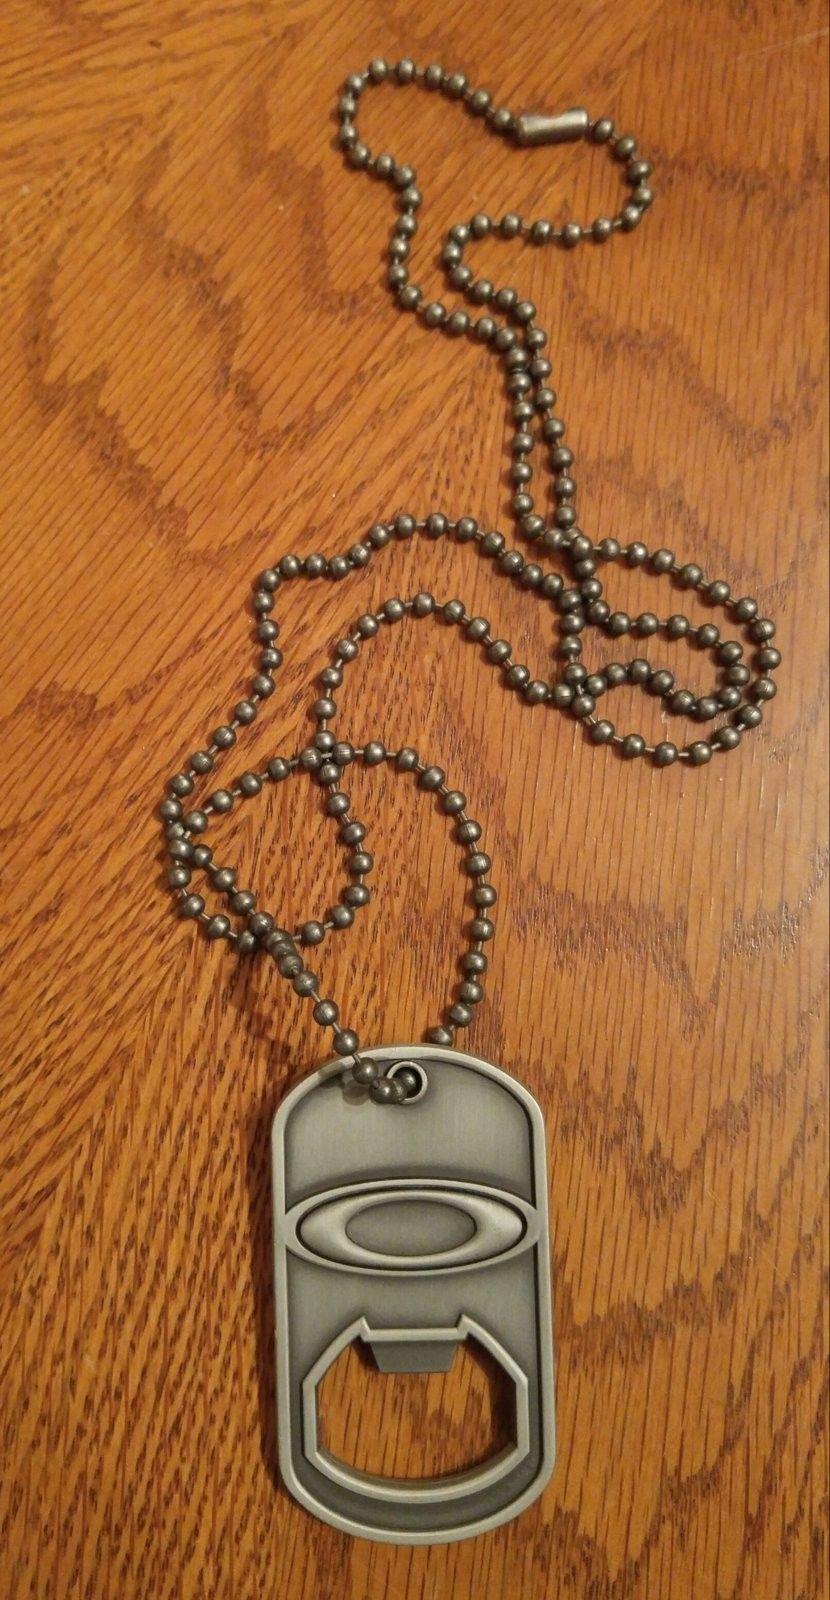 Bnib black leather wallet and bottle opener - 20160412_112740-1.jpg